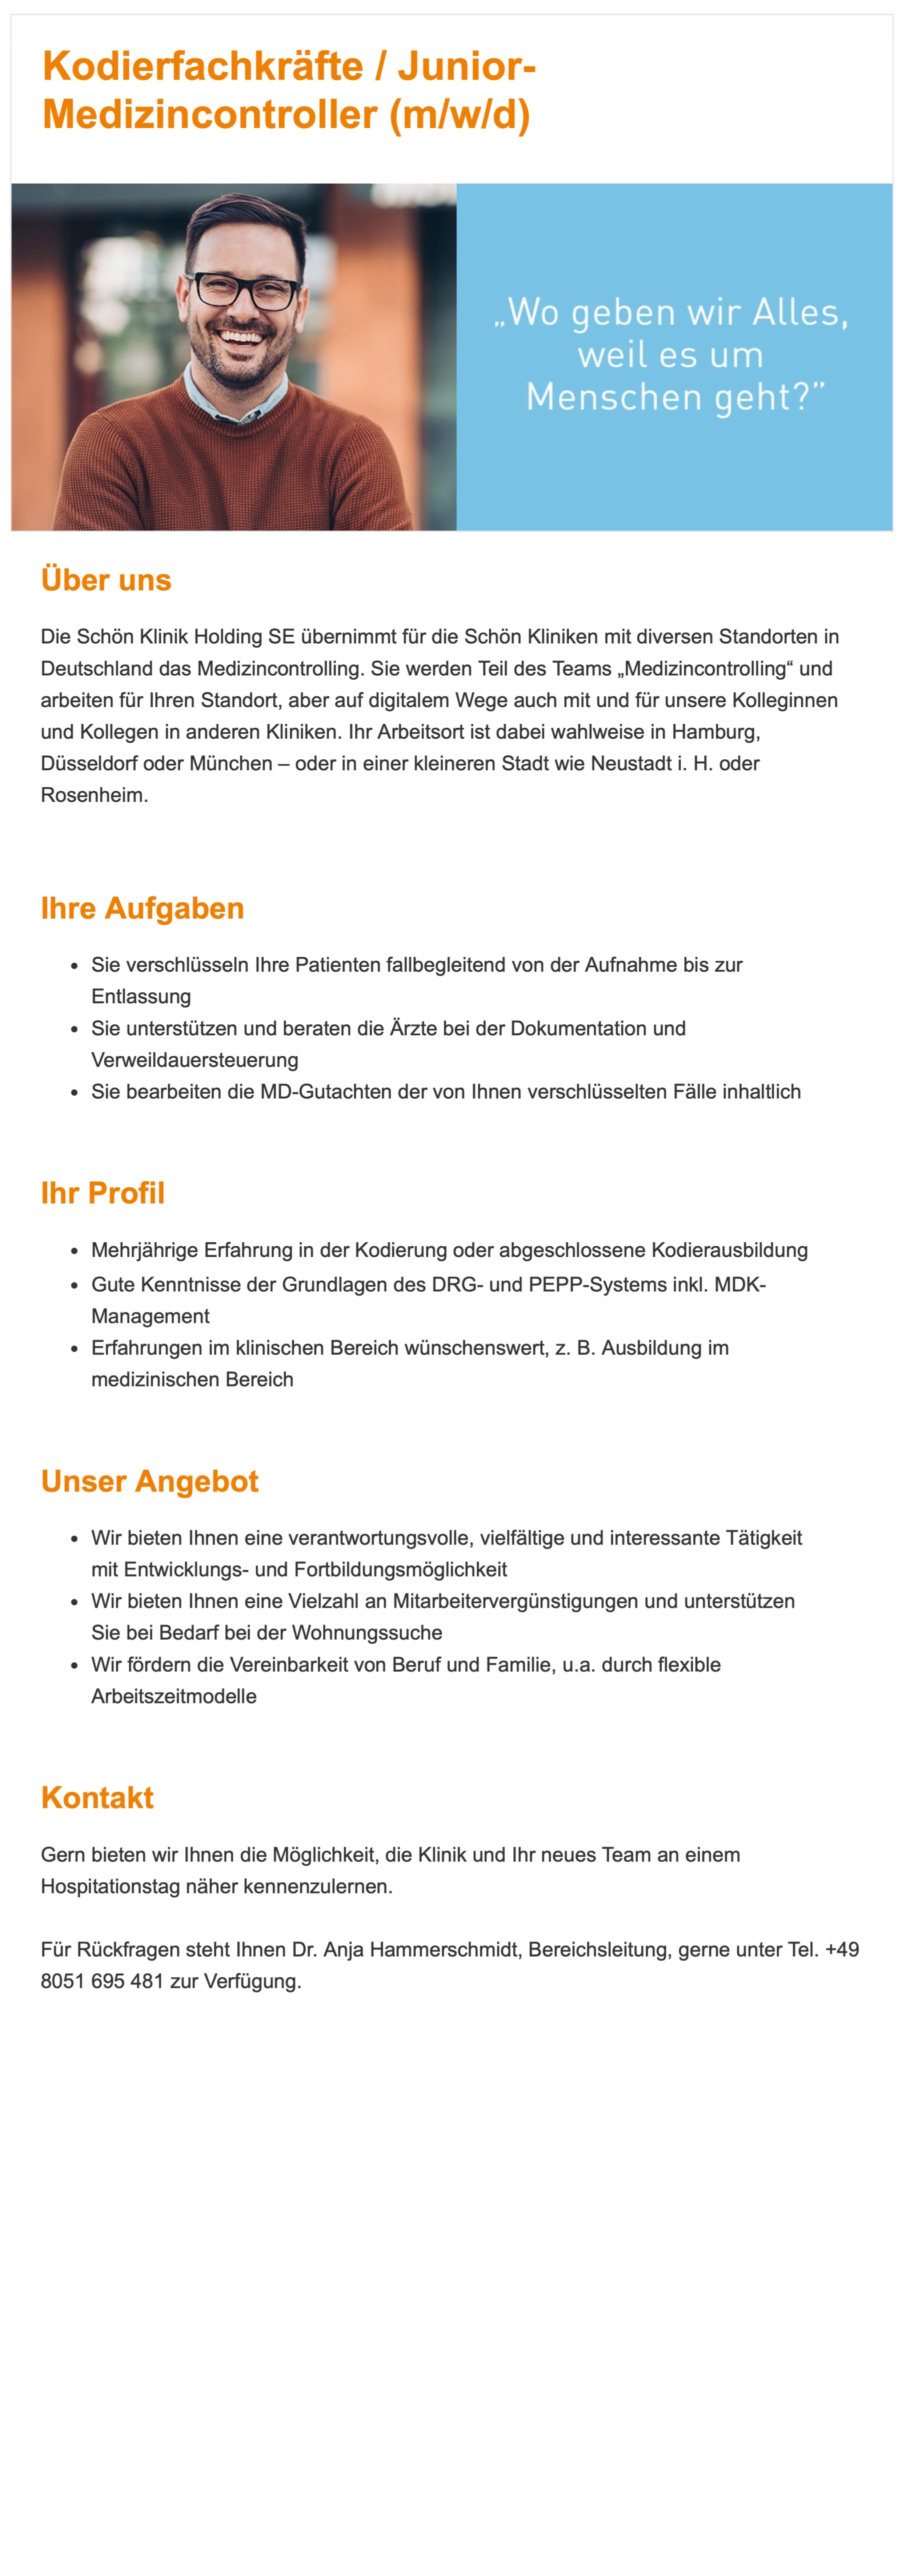 Kodierfachkräfte / Junior-Medizincontroller (m/w/d)